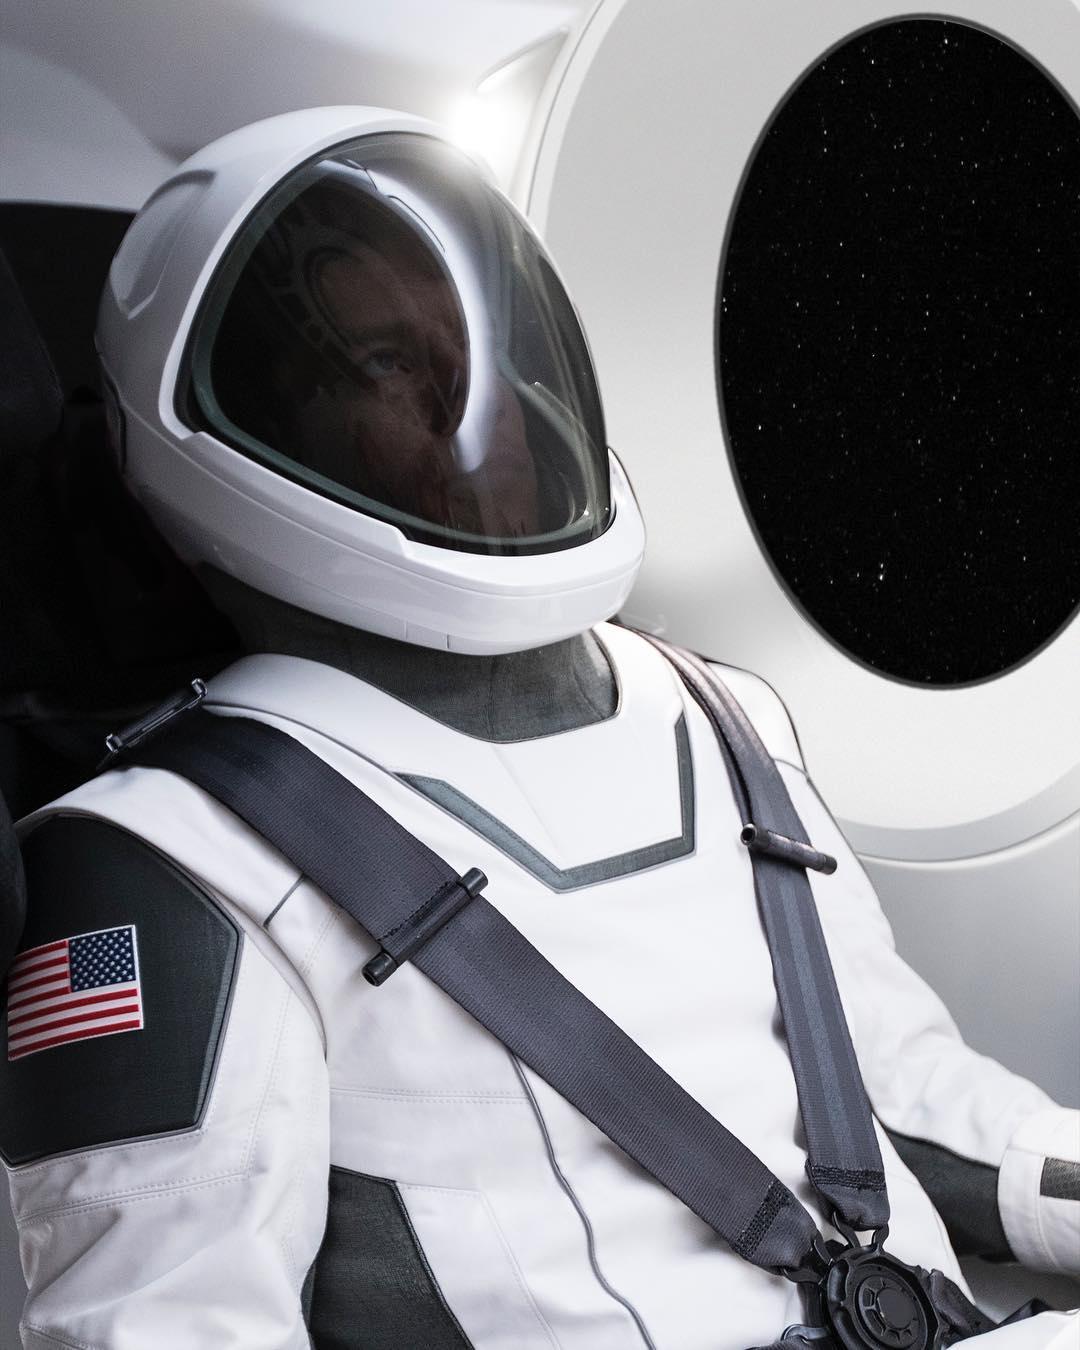 Илон Маск опубликовал первое фото скафандра SpaceX